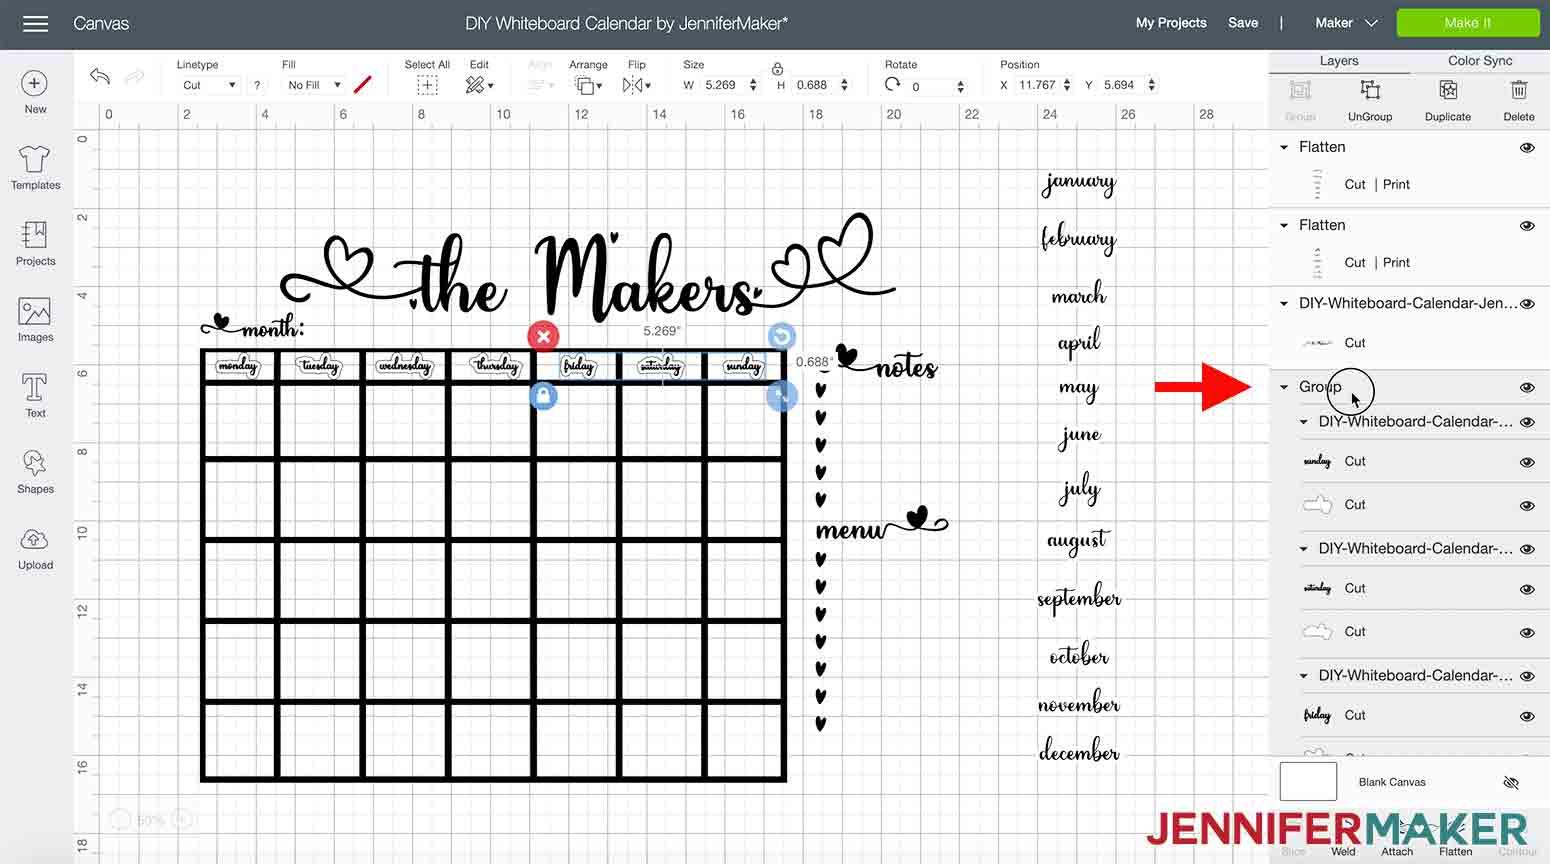 DIY-Whiteboard-Calendar-JenniferMaker-select-group-three